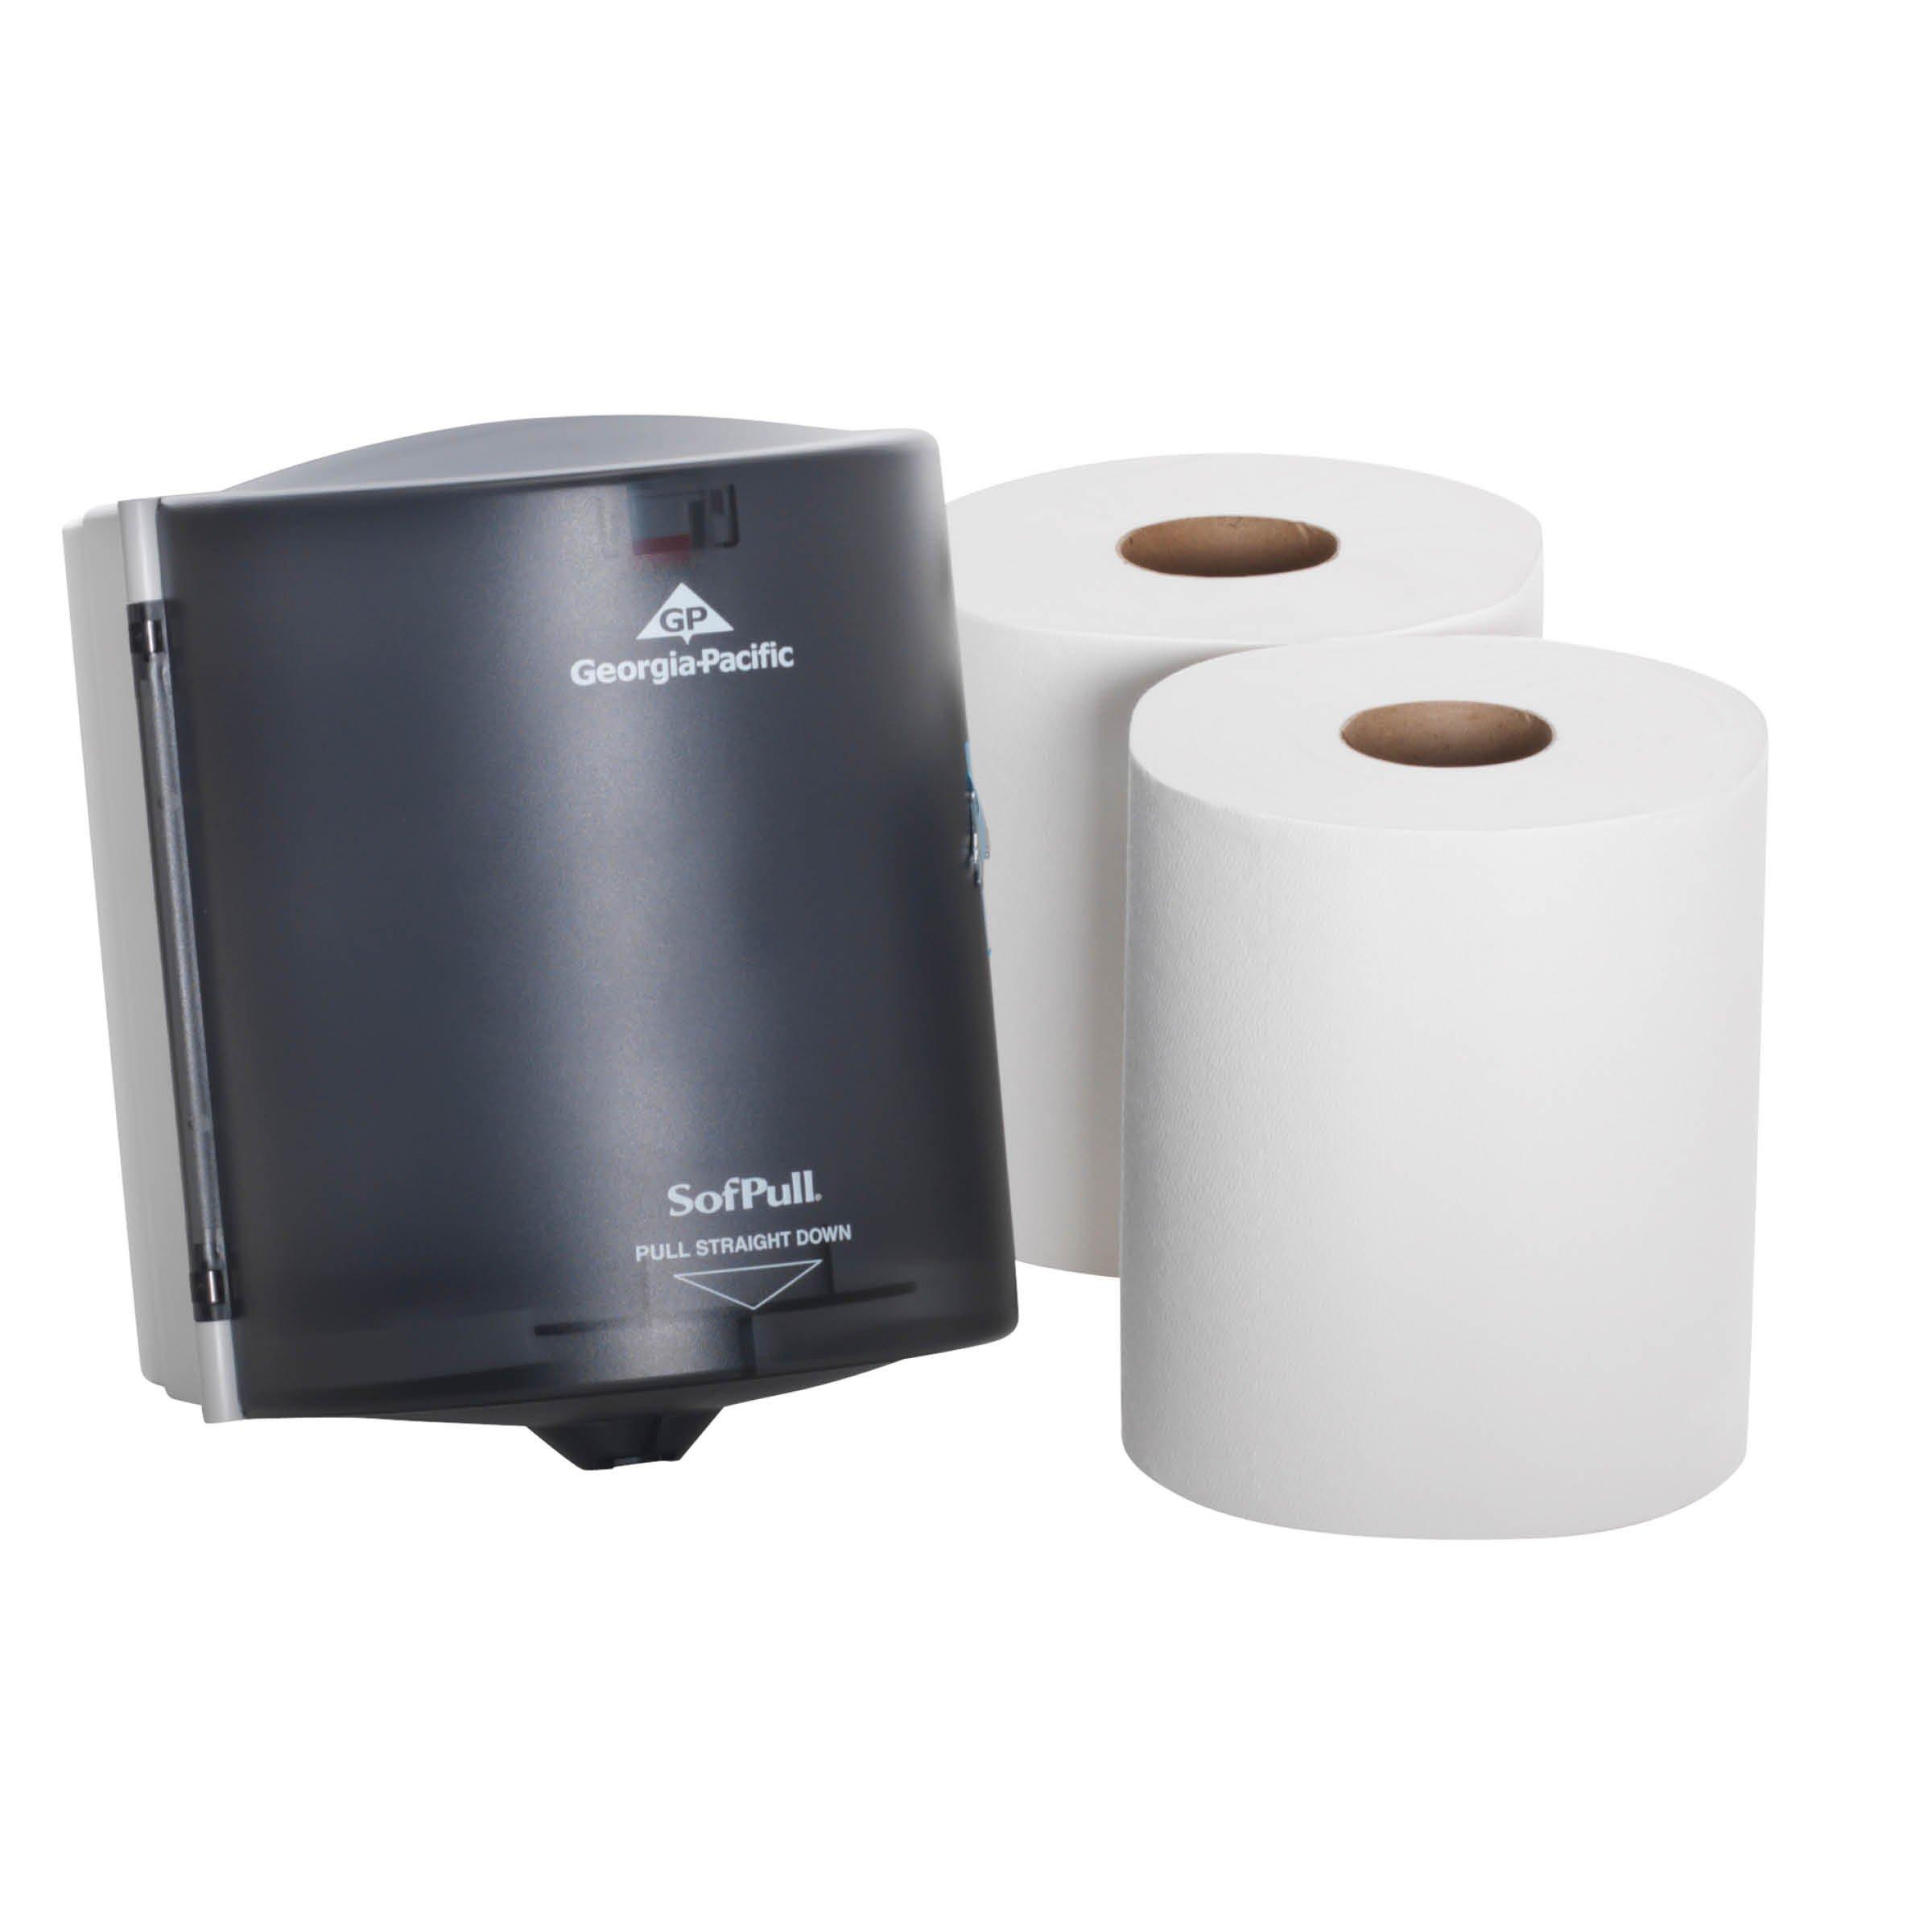 SofPull Centerpull Regular Capacity Paper Towel Dispenser Trial Kit by GP PRO, 58205, 1 Dispenser (58204) & 2 Centerpull Paper Towel Rolls, (28124)